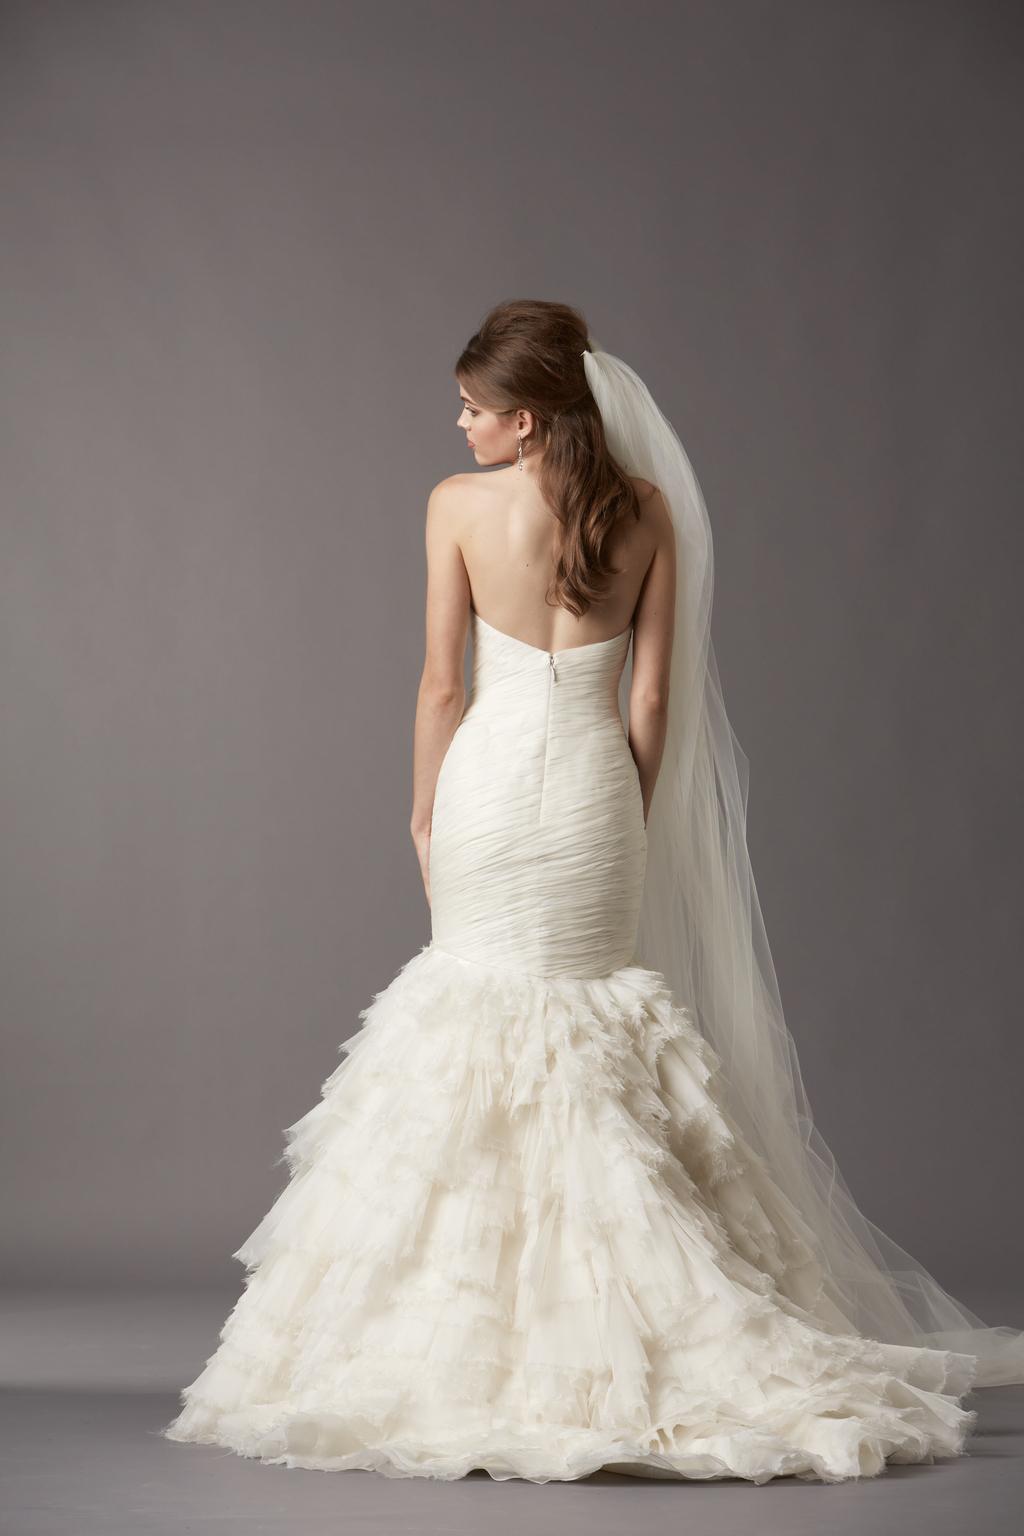 Watters-bridal-gowns-fall-2013-wedding-dress-4022b-a.full